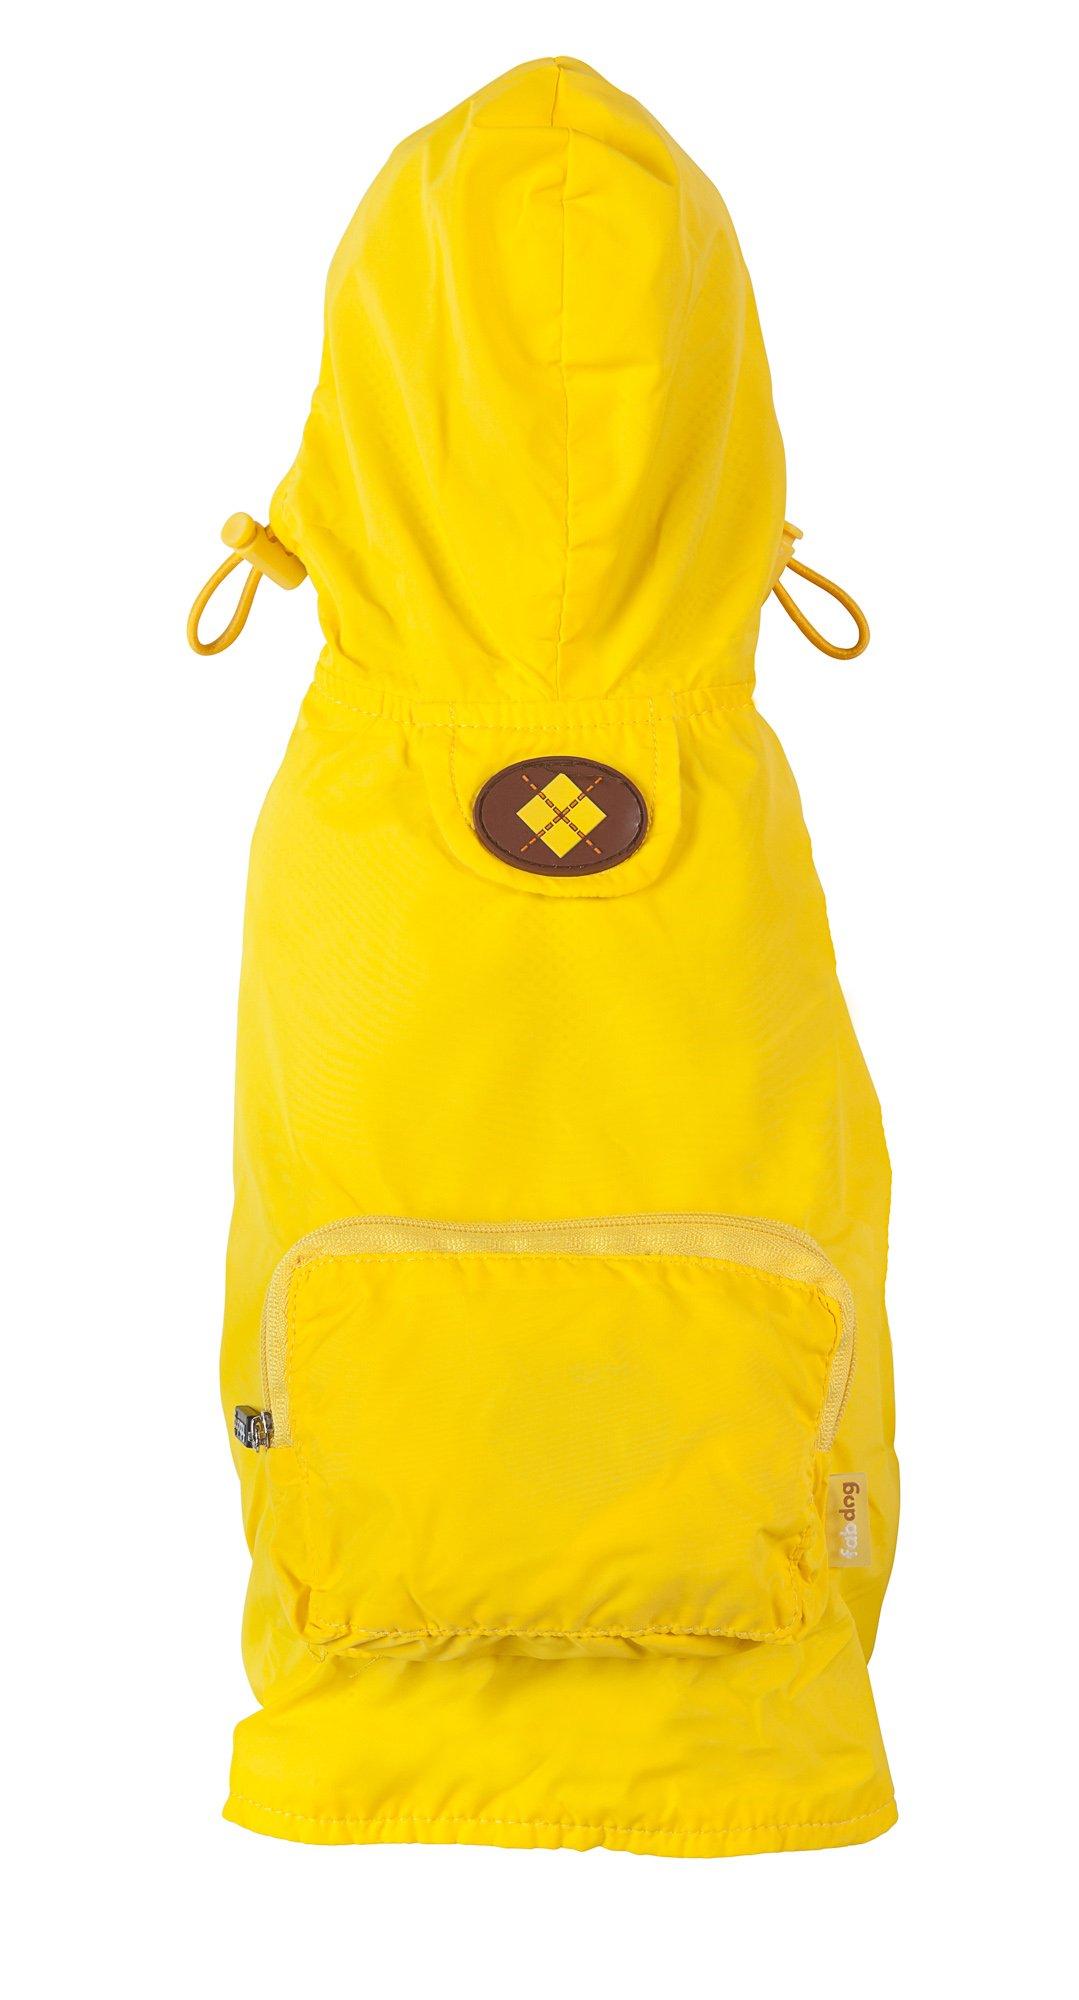 fabdog Packable Dog Raincoat, Medium (Yellow) by fabdog